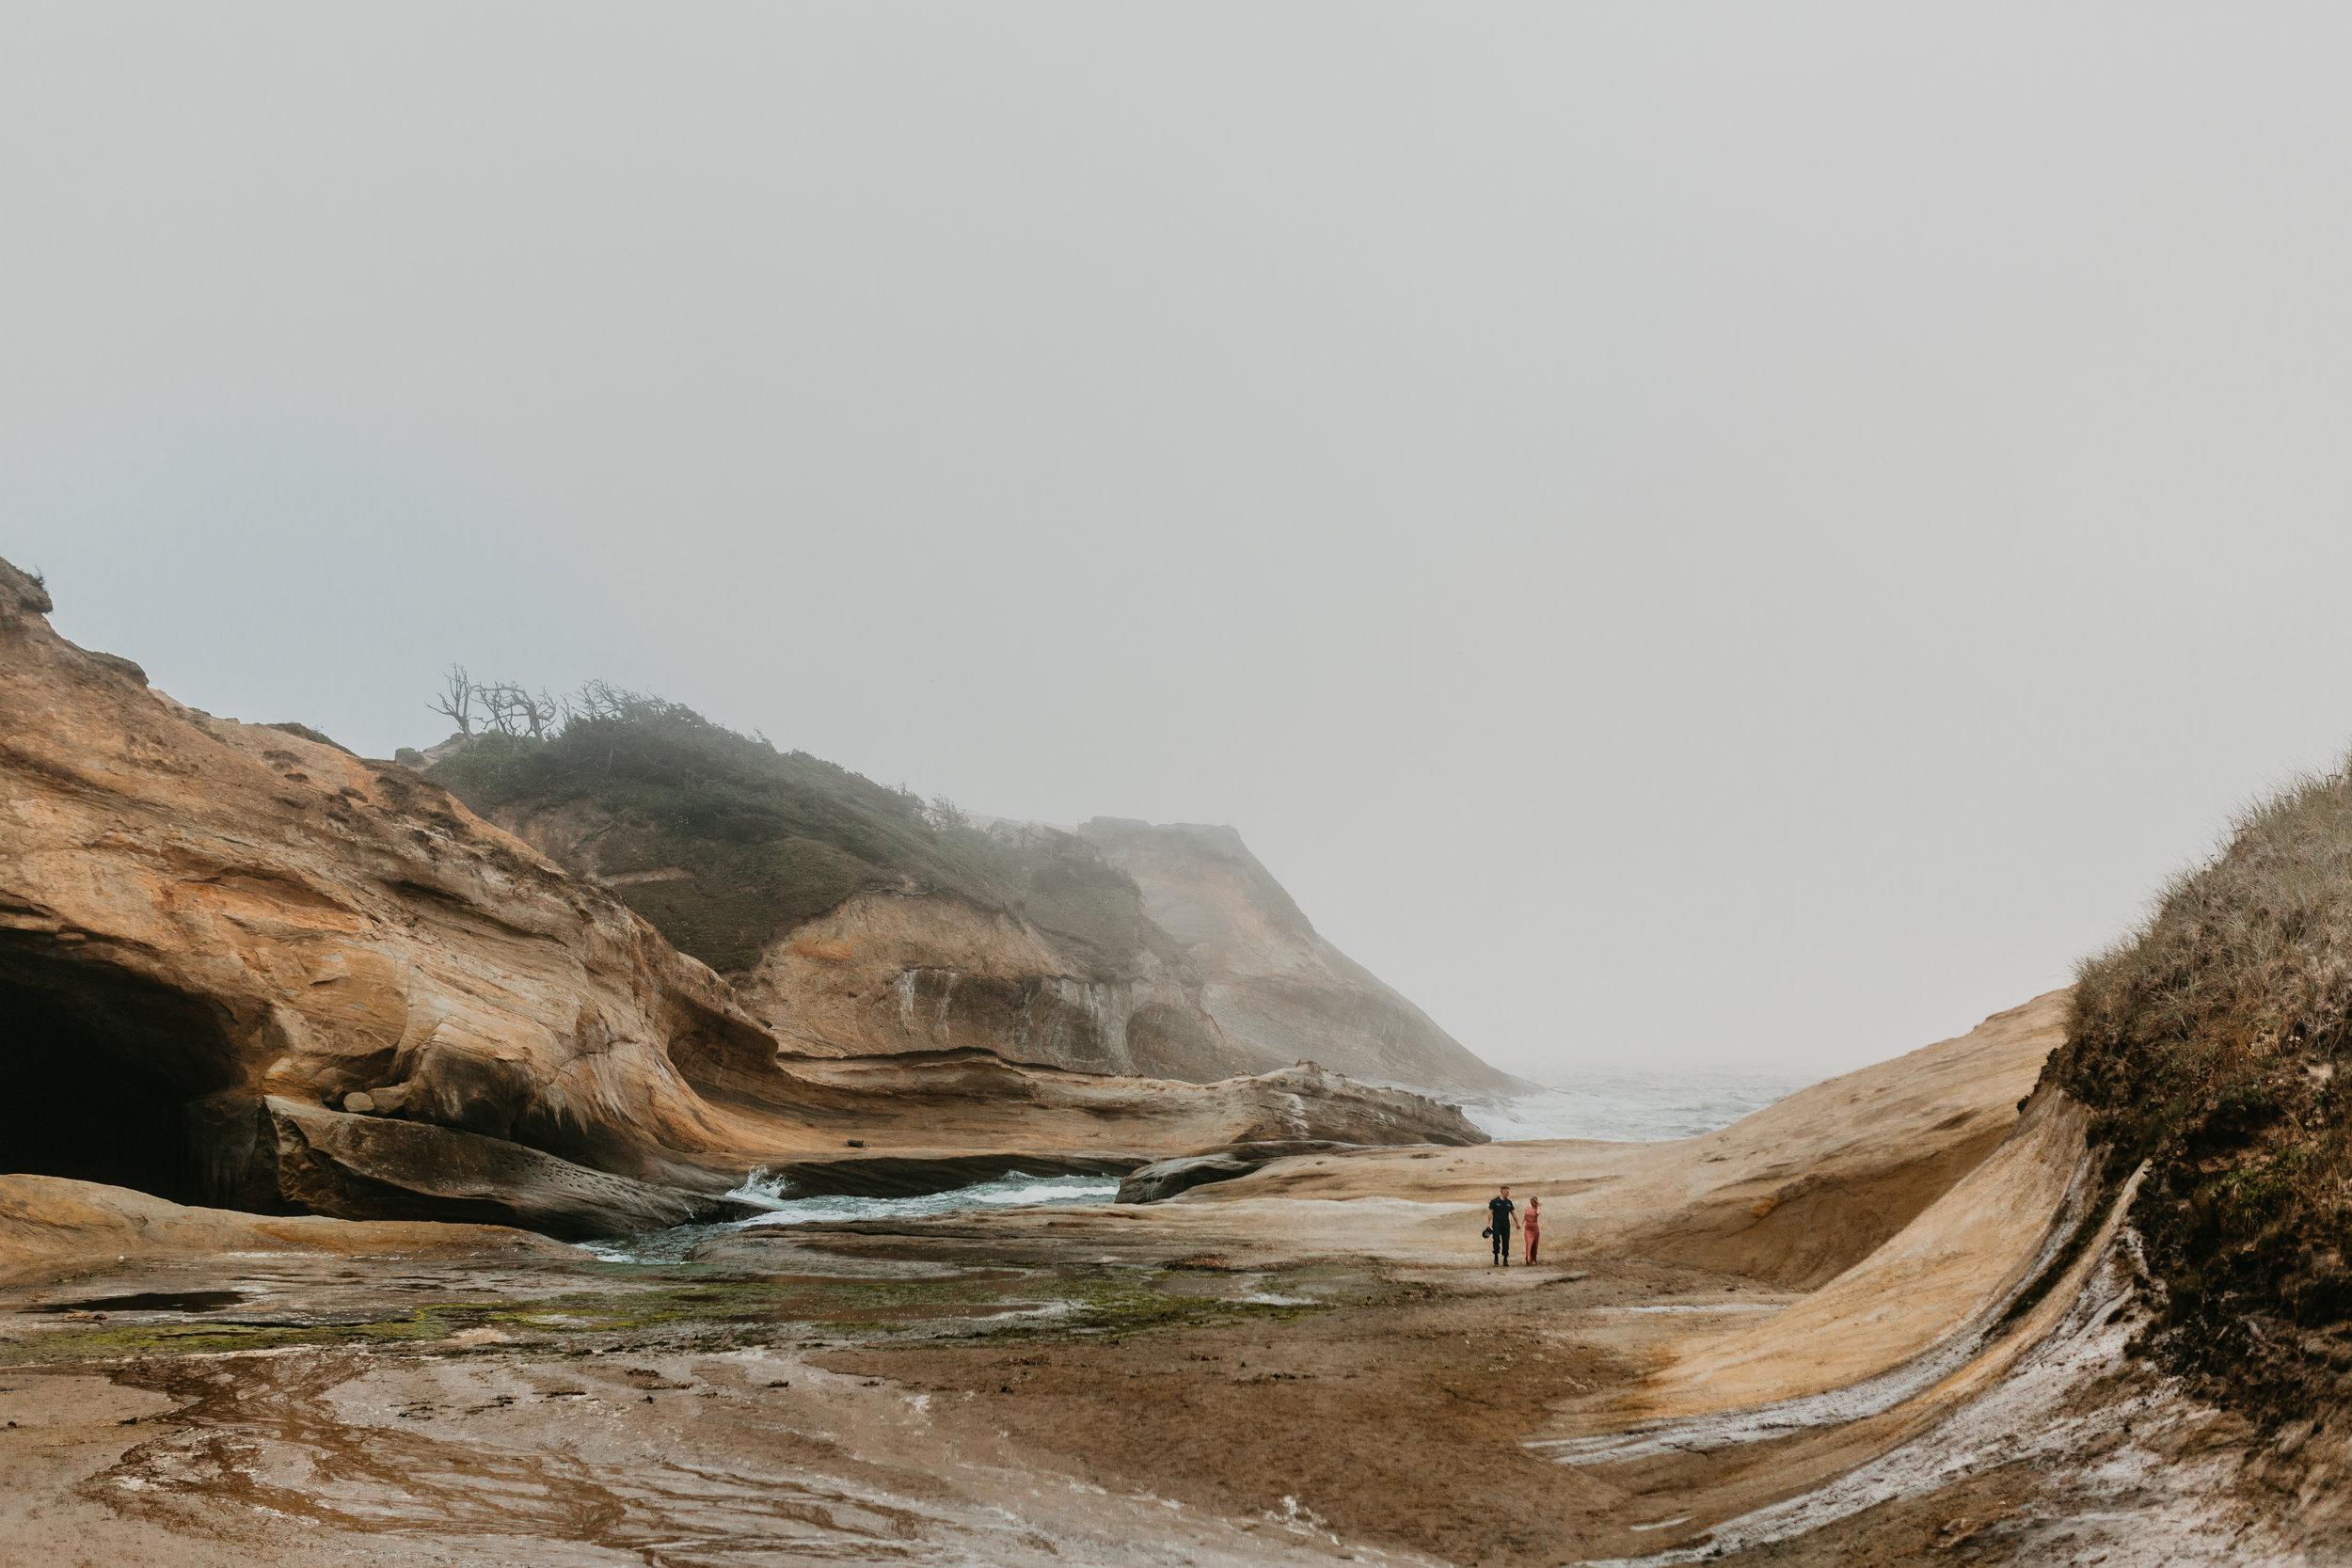 Nicole-daacke-photography-cape-kiwanda-foggy-adventure-session-engagement-session-anniversary-photos-oregon-coast-pacific-city-oregon-elopement-photographer-30.jpg